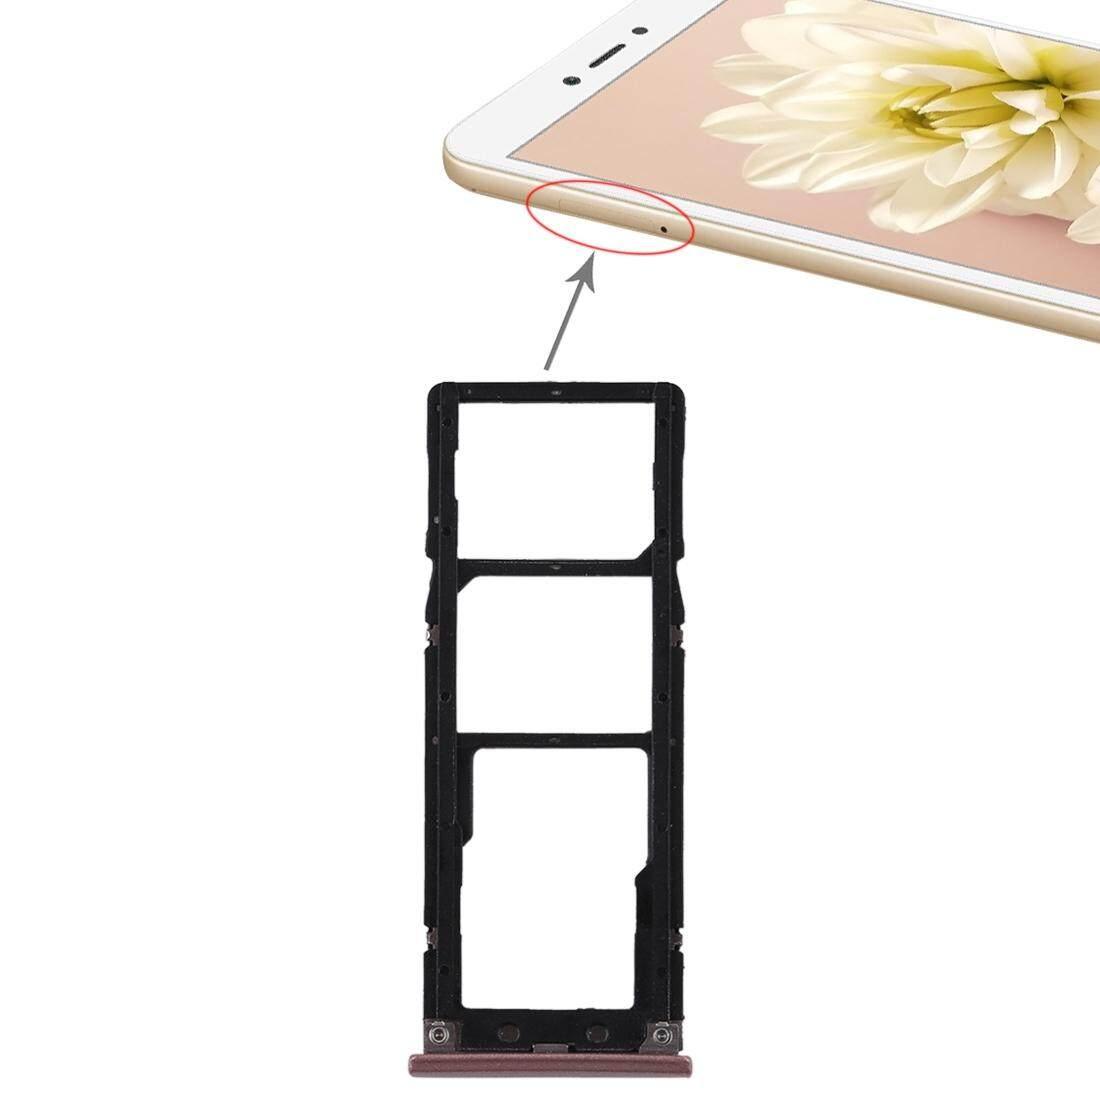 2 Kartu SIM + Micro Tray SD Card untuk Xiaomi Redmi Note 5A (Mawar Emas)